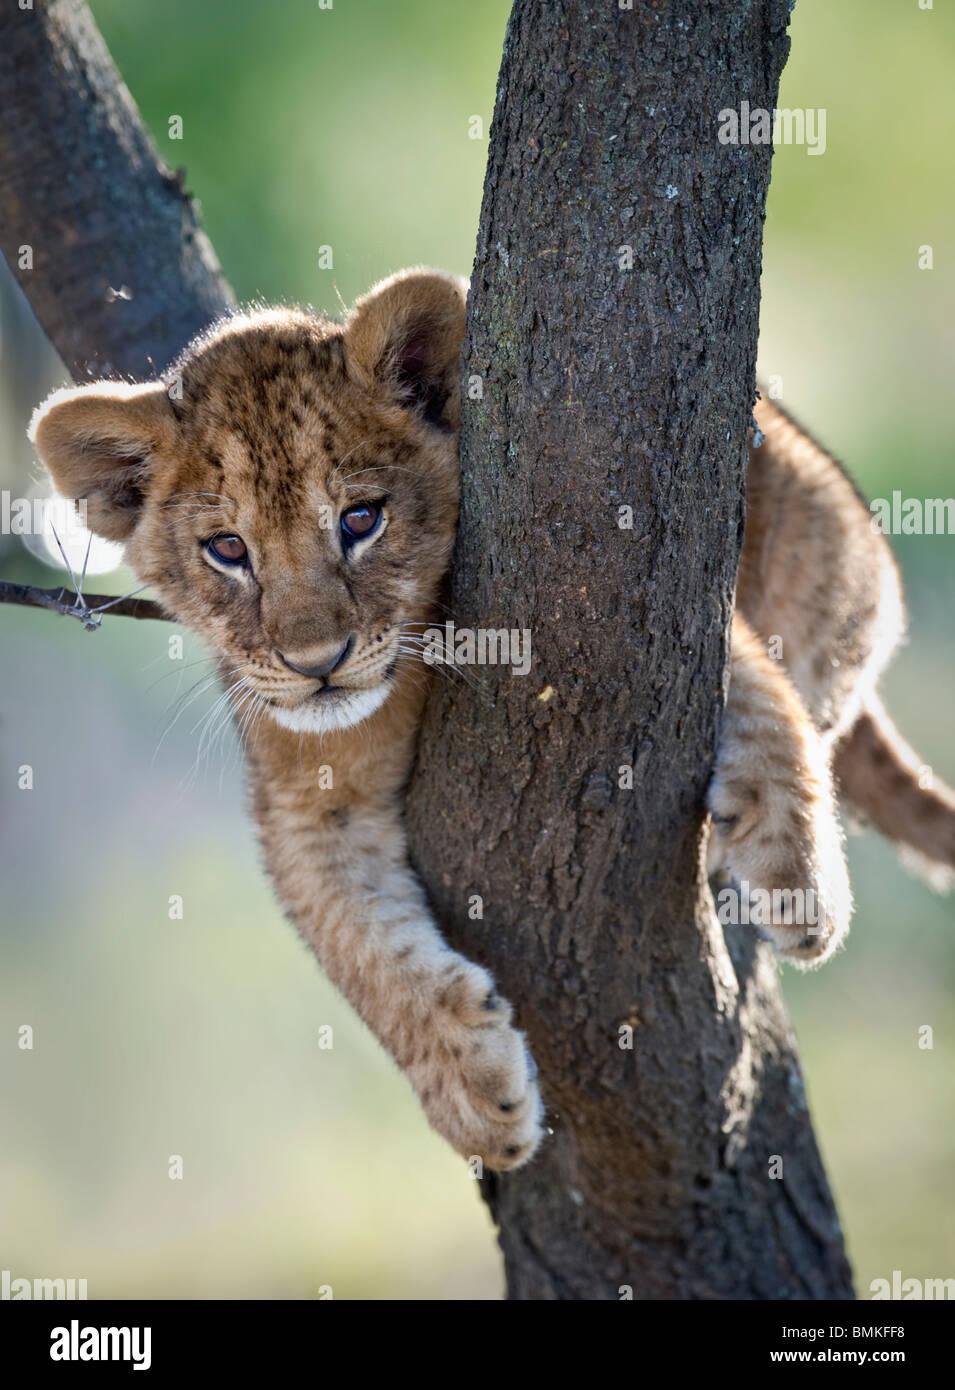 Lion cub about 3 months old, climbing a tree. Near Ndutu, Ngorongoro Conservation Area / Serengeti National Park, - Stock Image